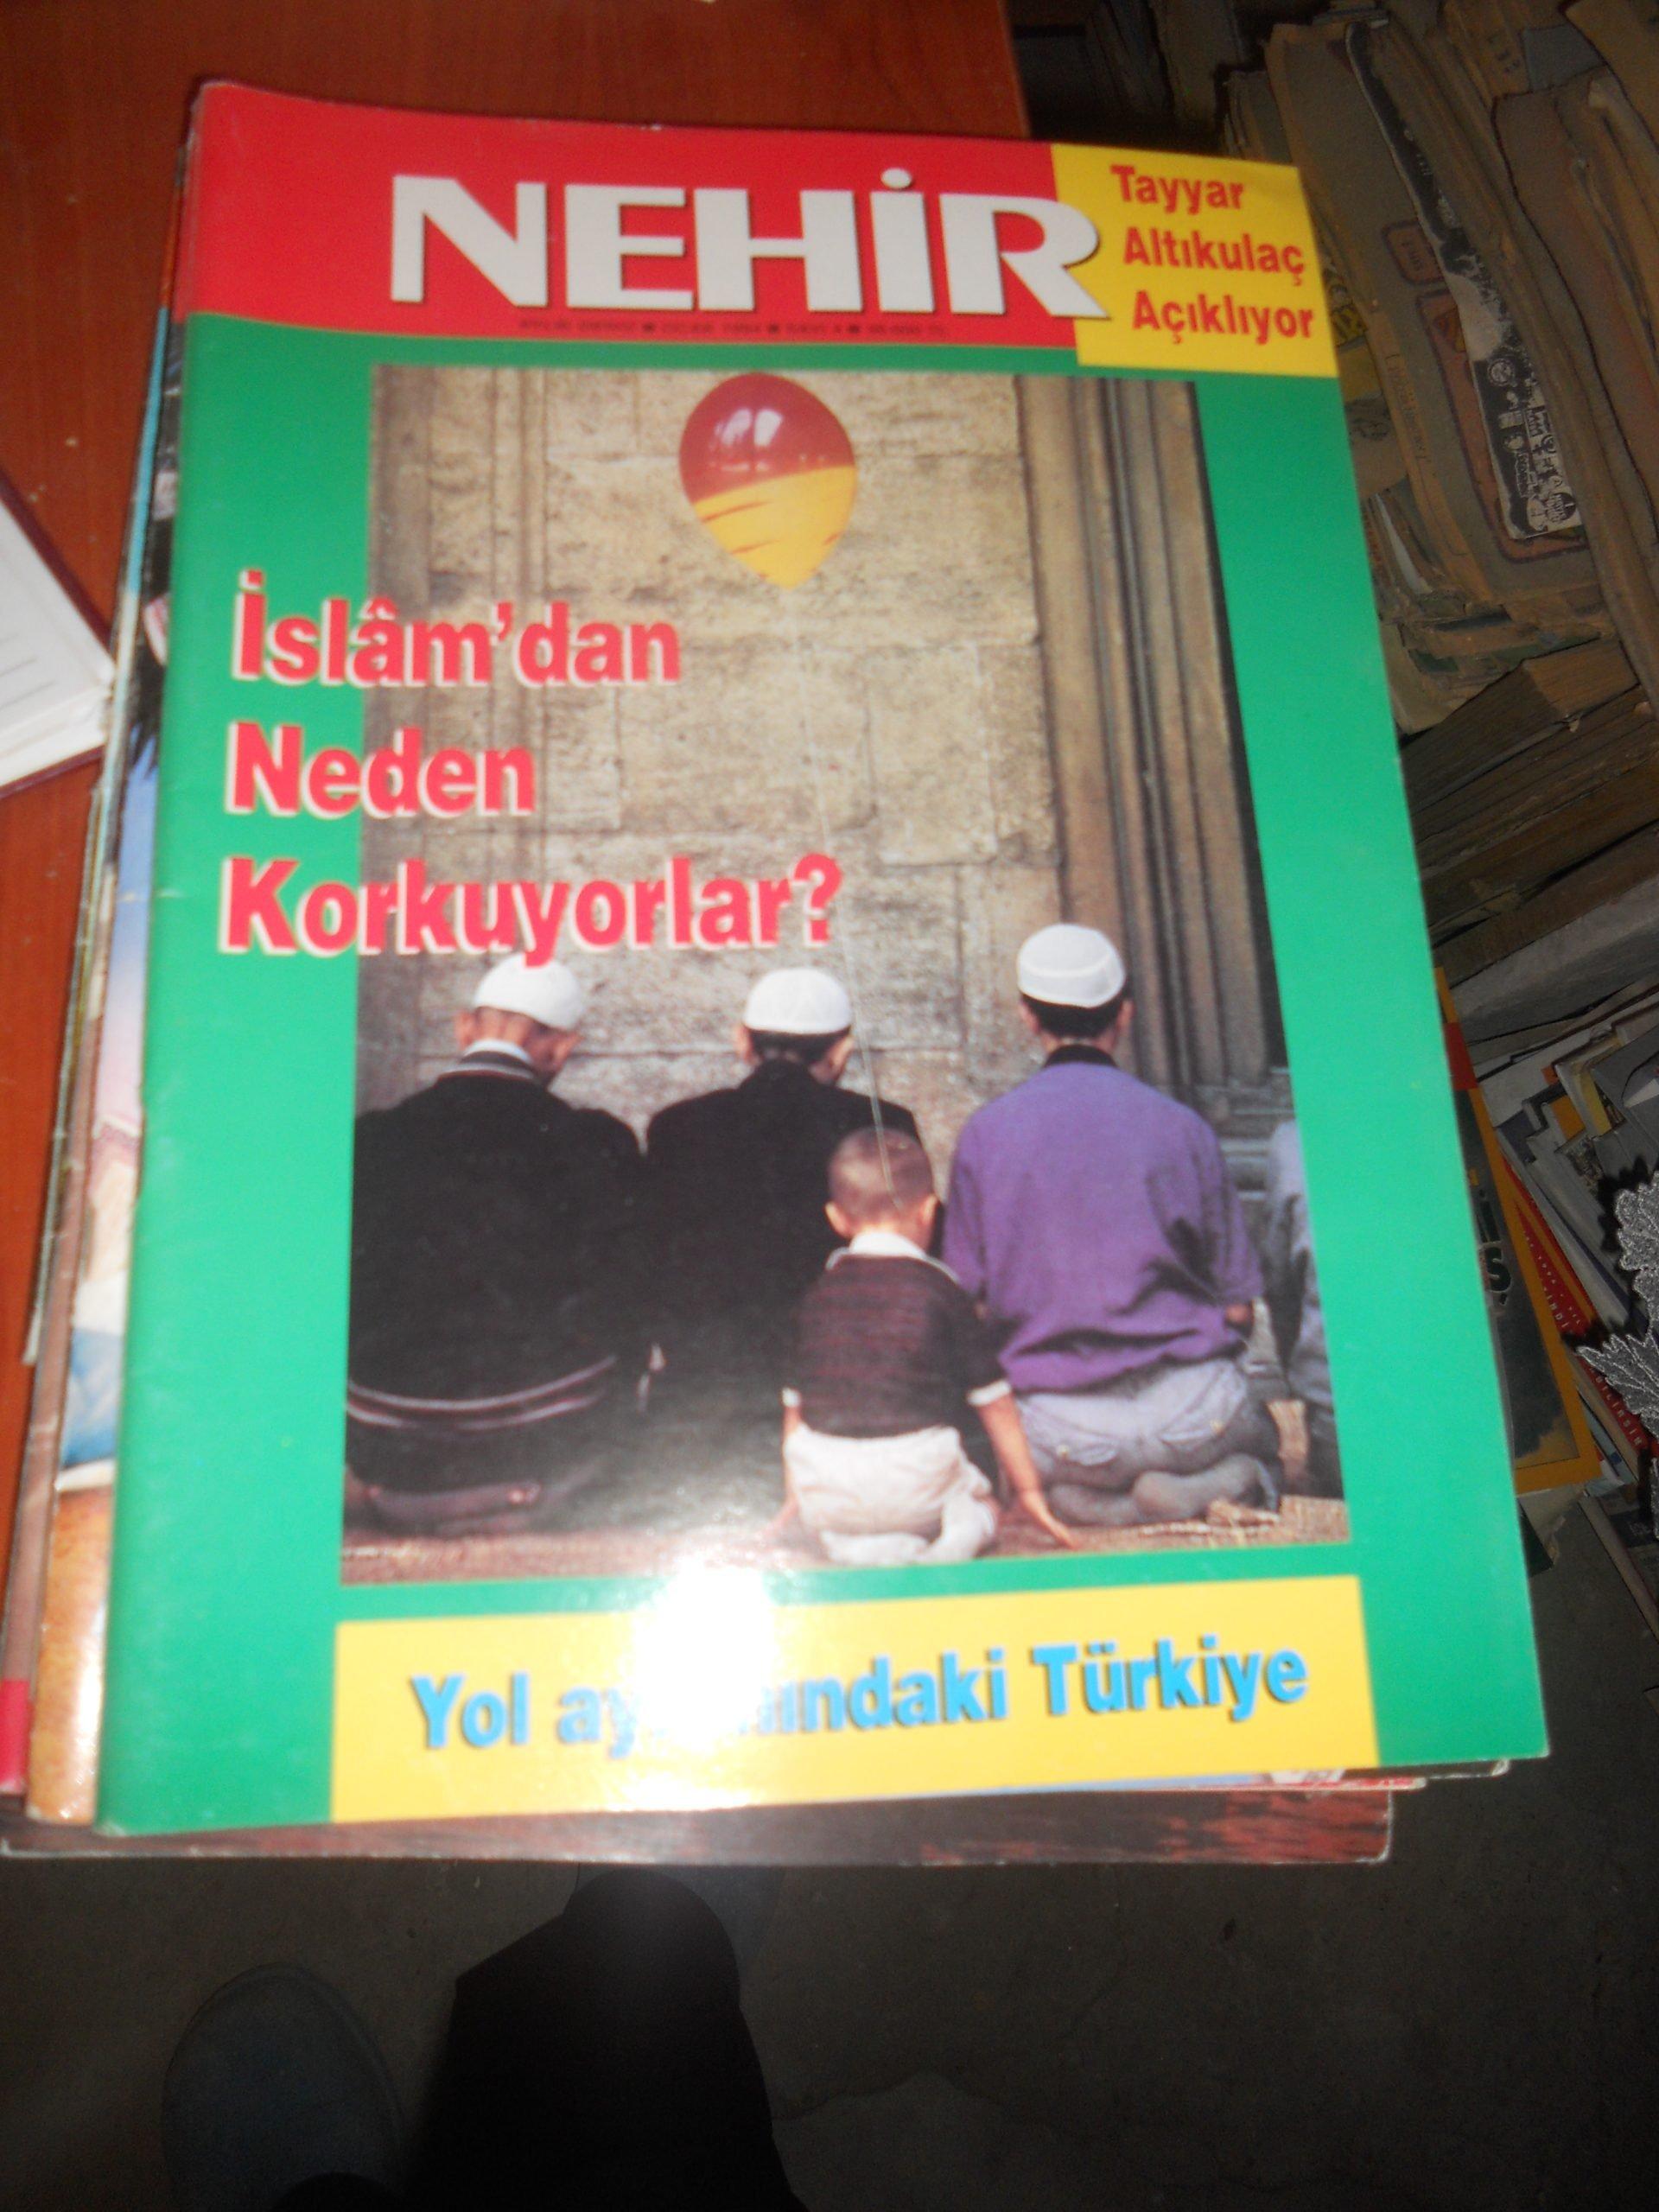 NEHİR DERGİSİ/7 ADET/1993-1995 arası/Toplam 35 tl